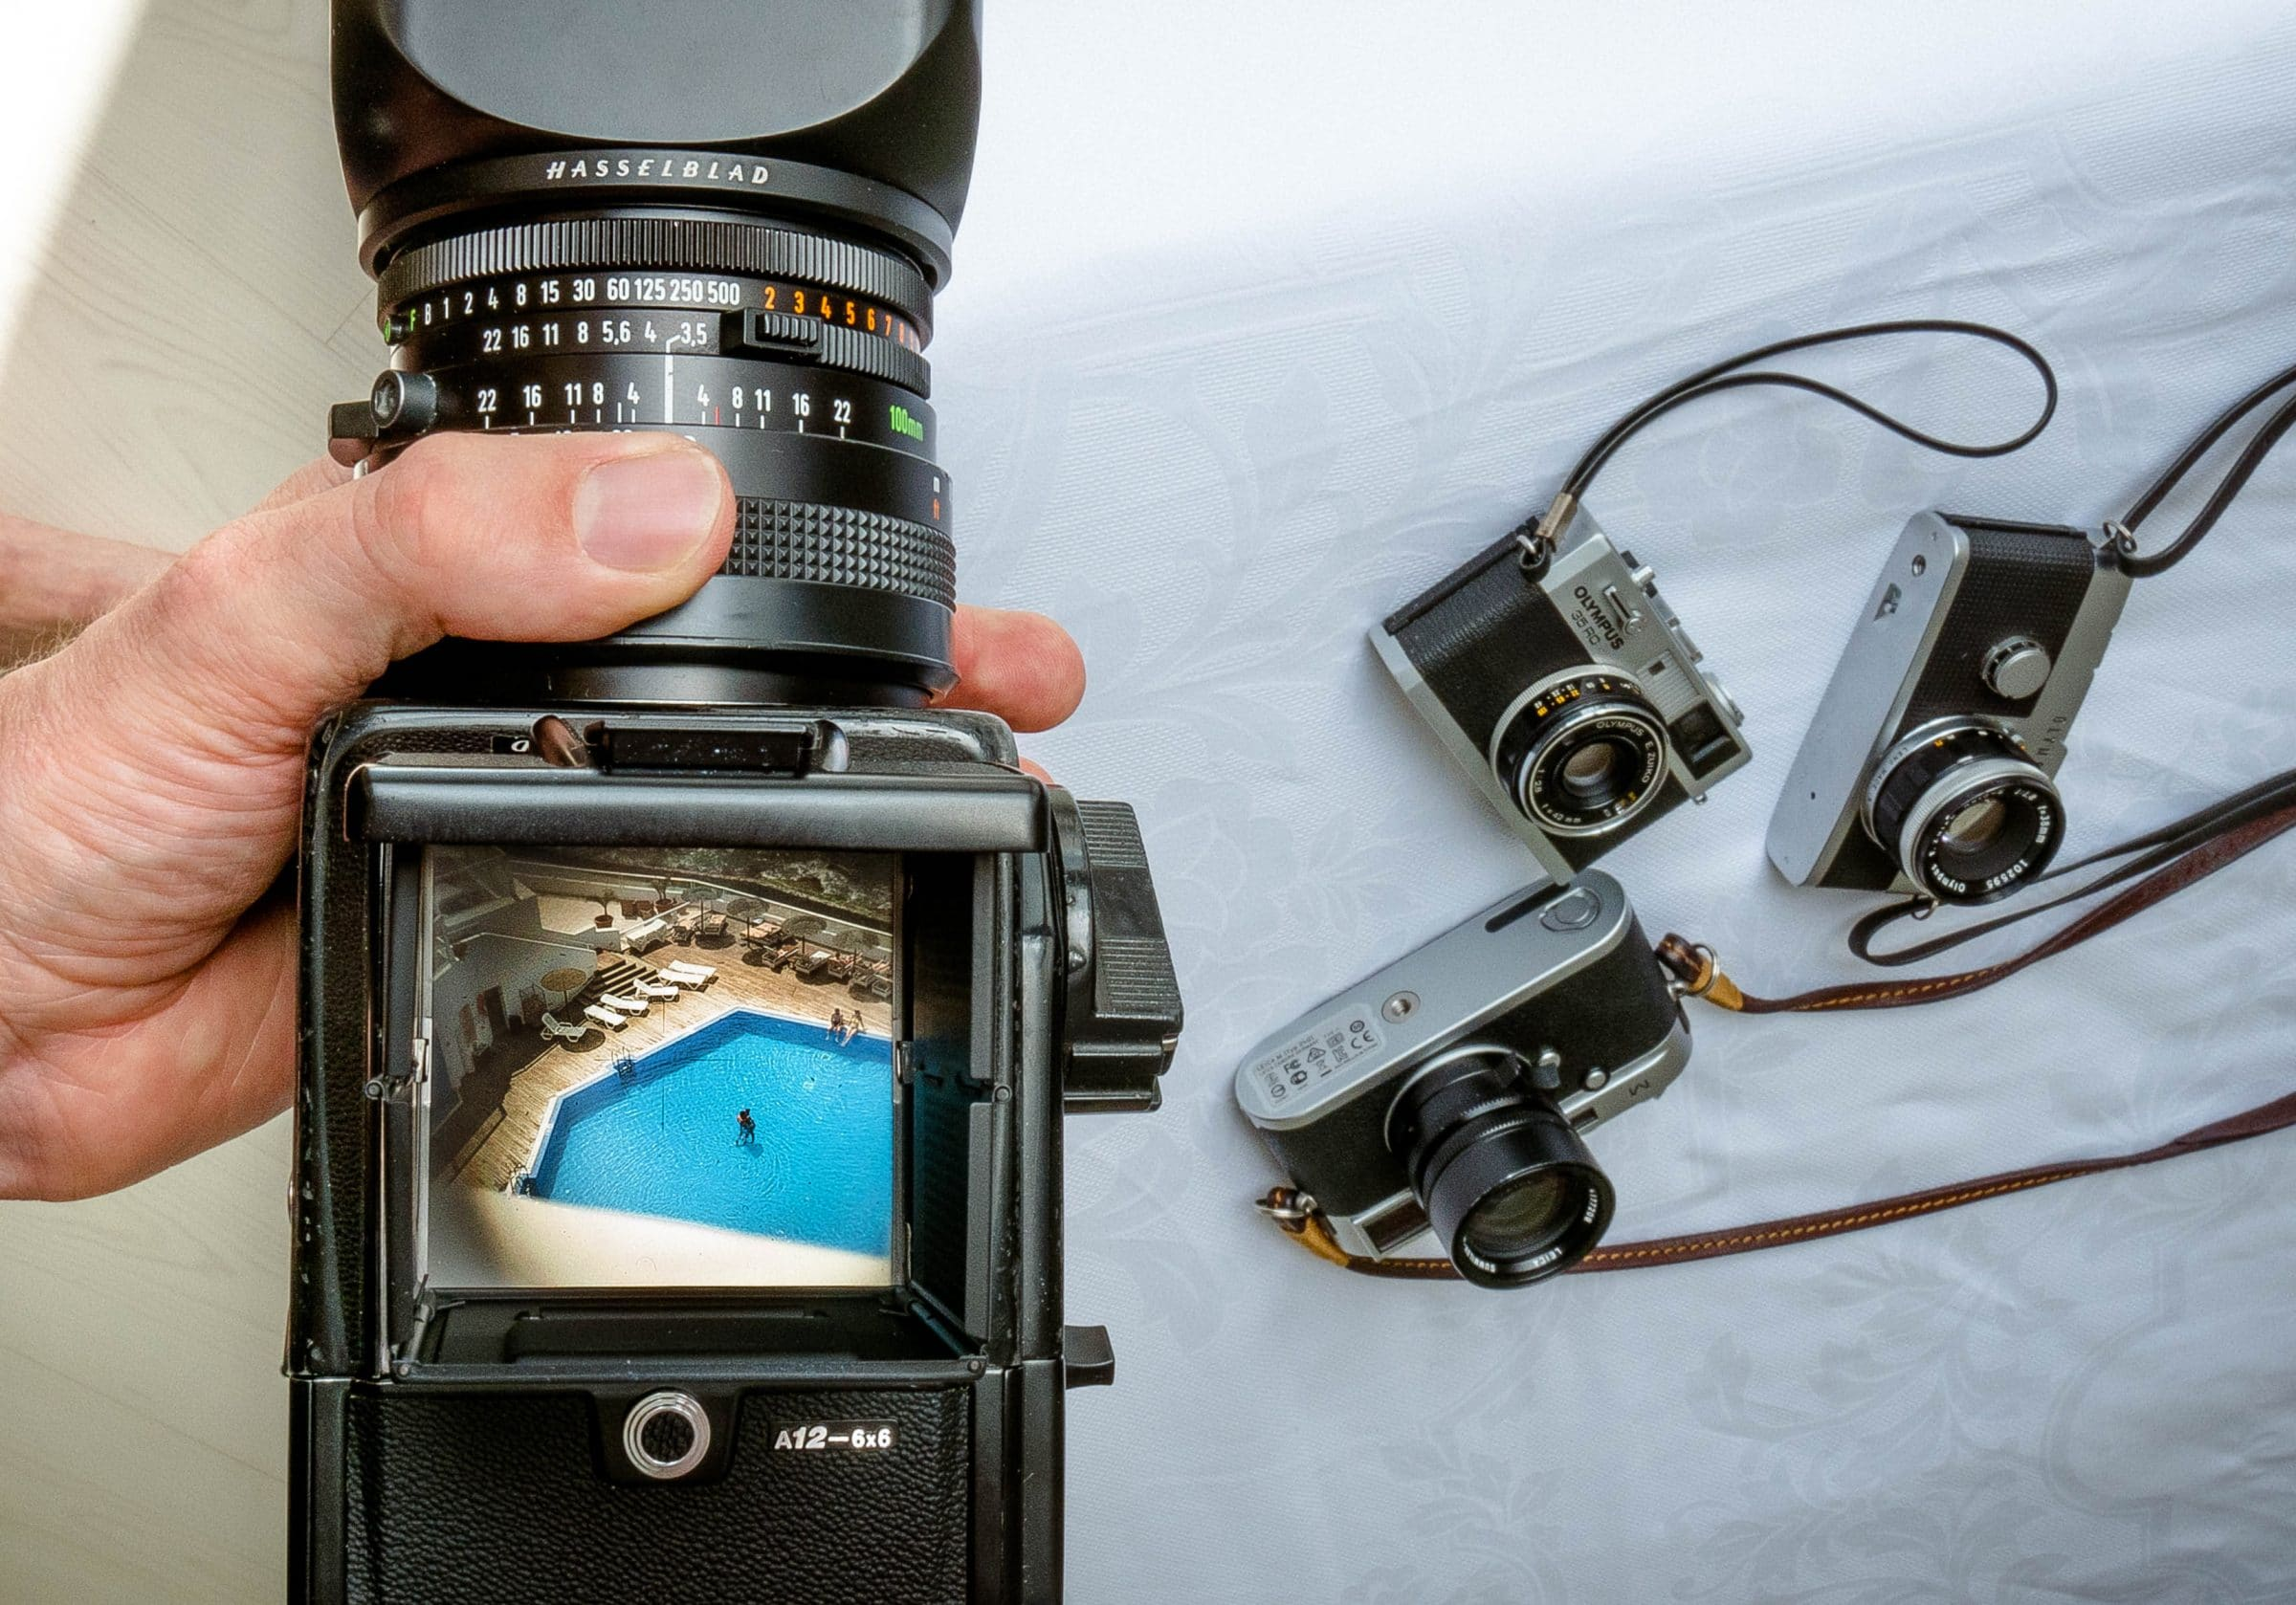 Hasselblad, Leica M, Olympus 35 RC, Olympus Pen F cameras - silver cameras